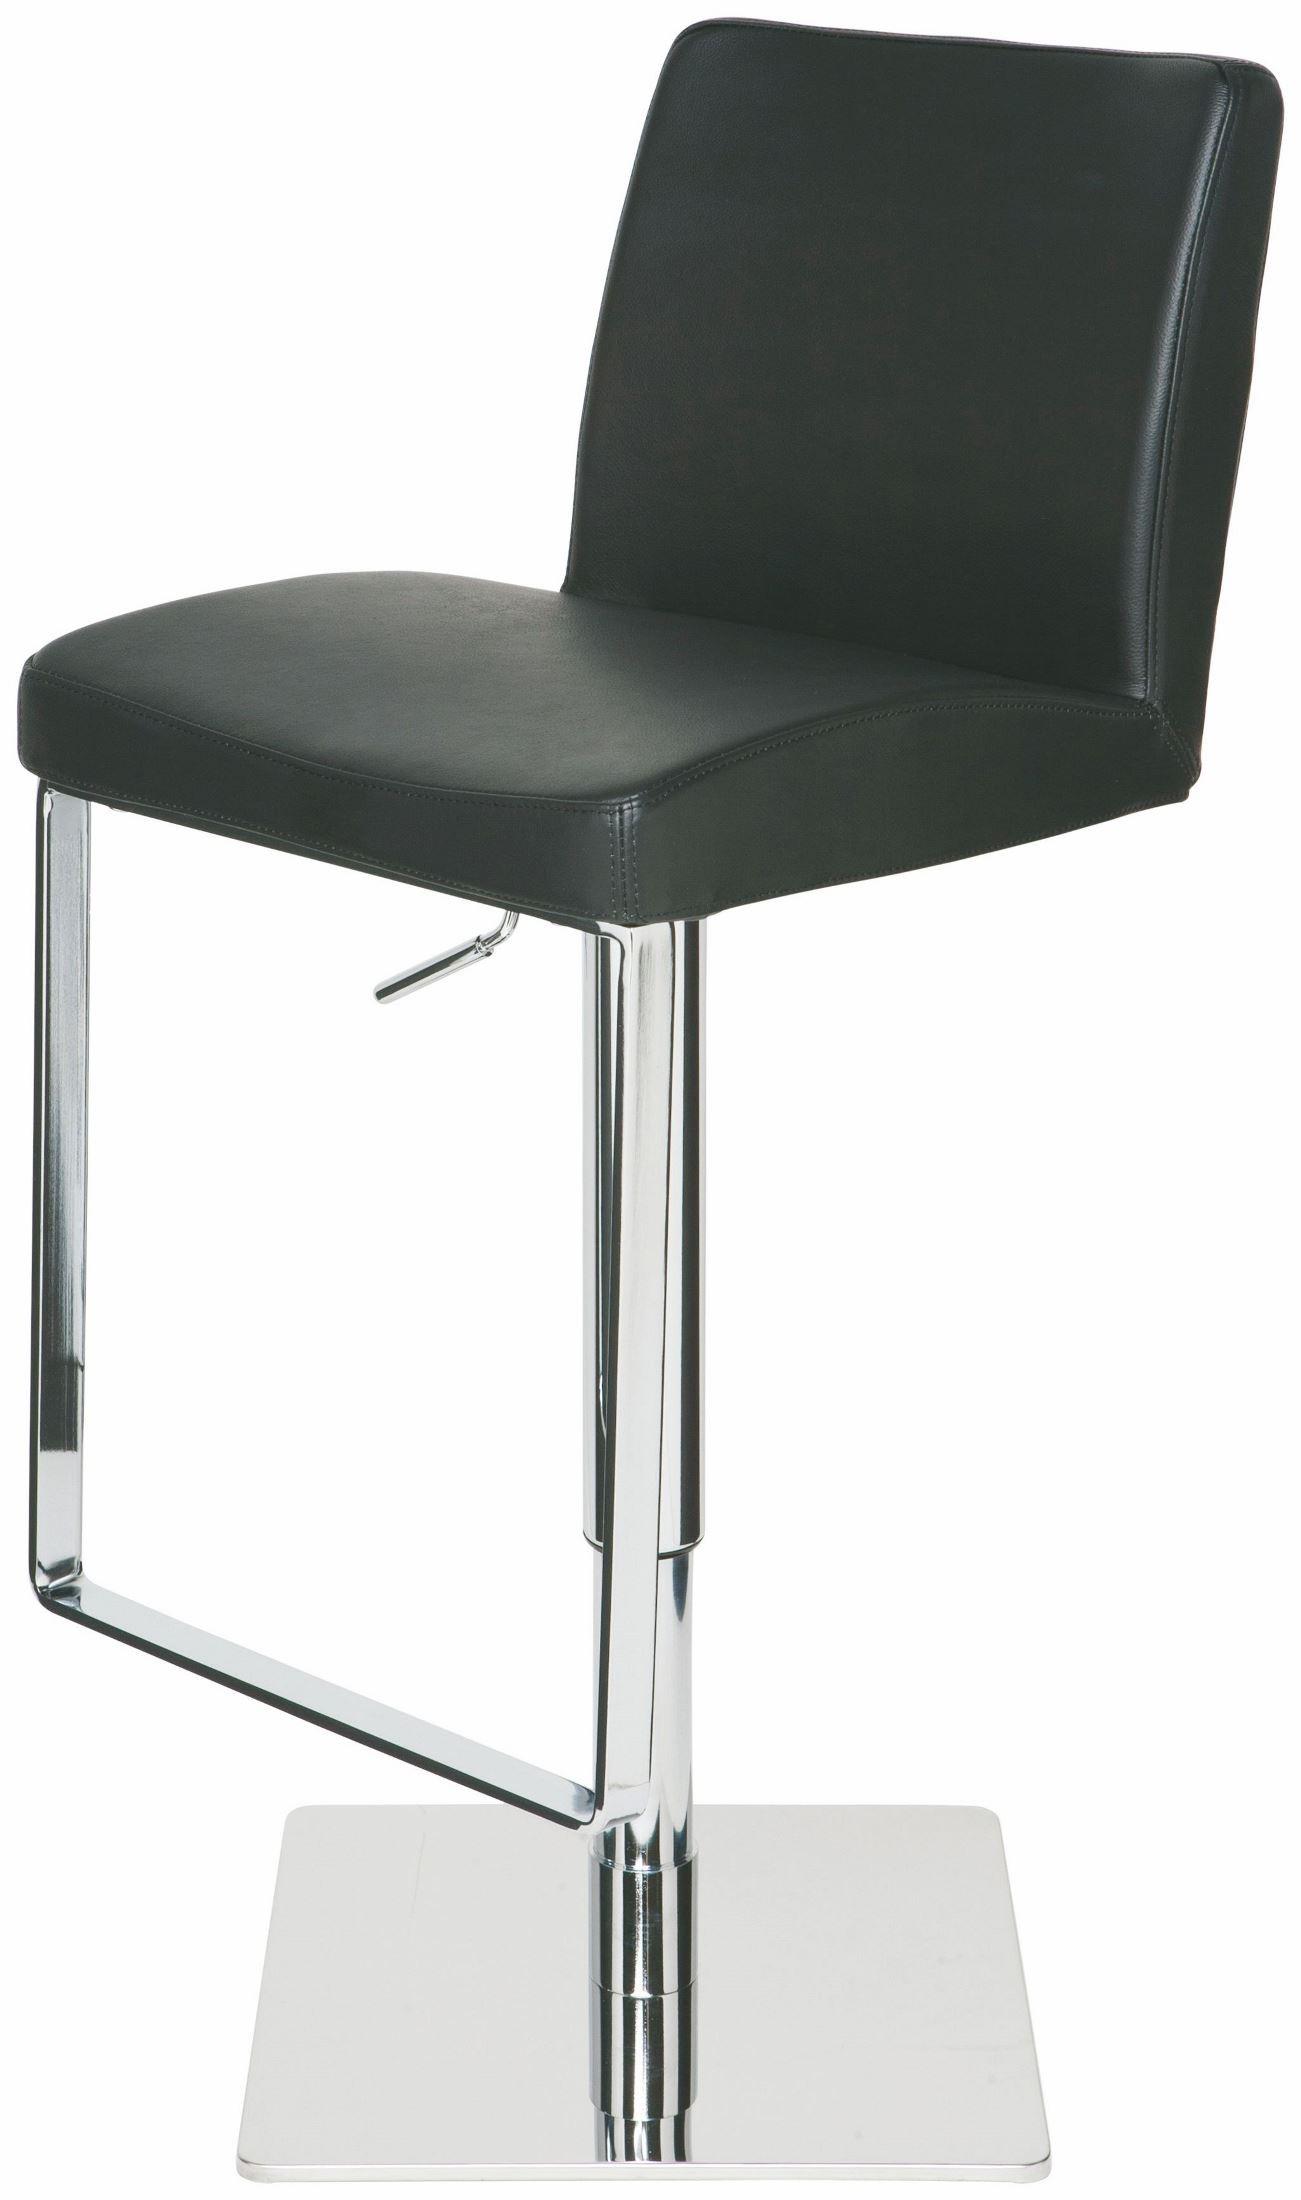 Matteo Black Leather Adjustable Stool From Nuevo Coleman Furniture